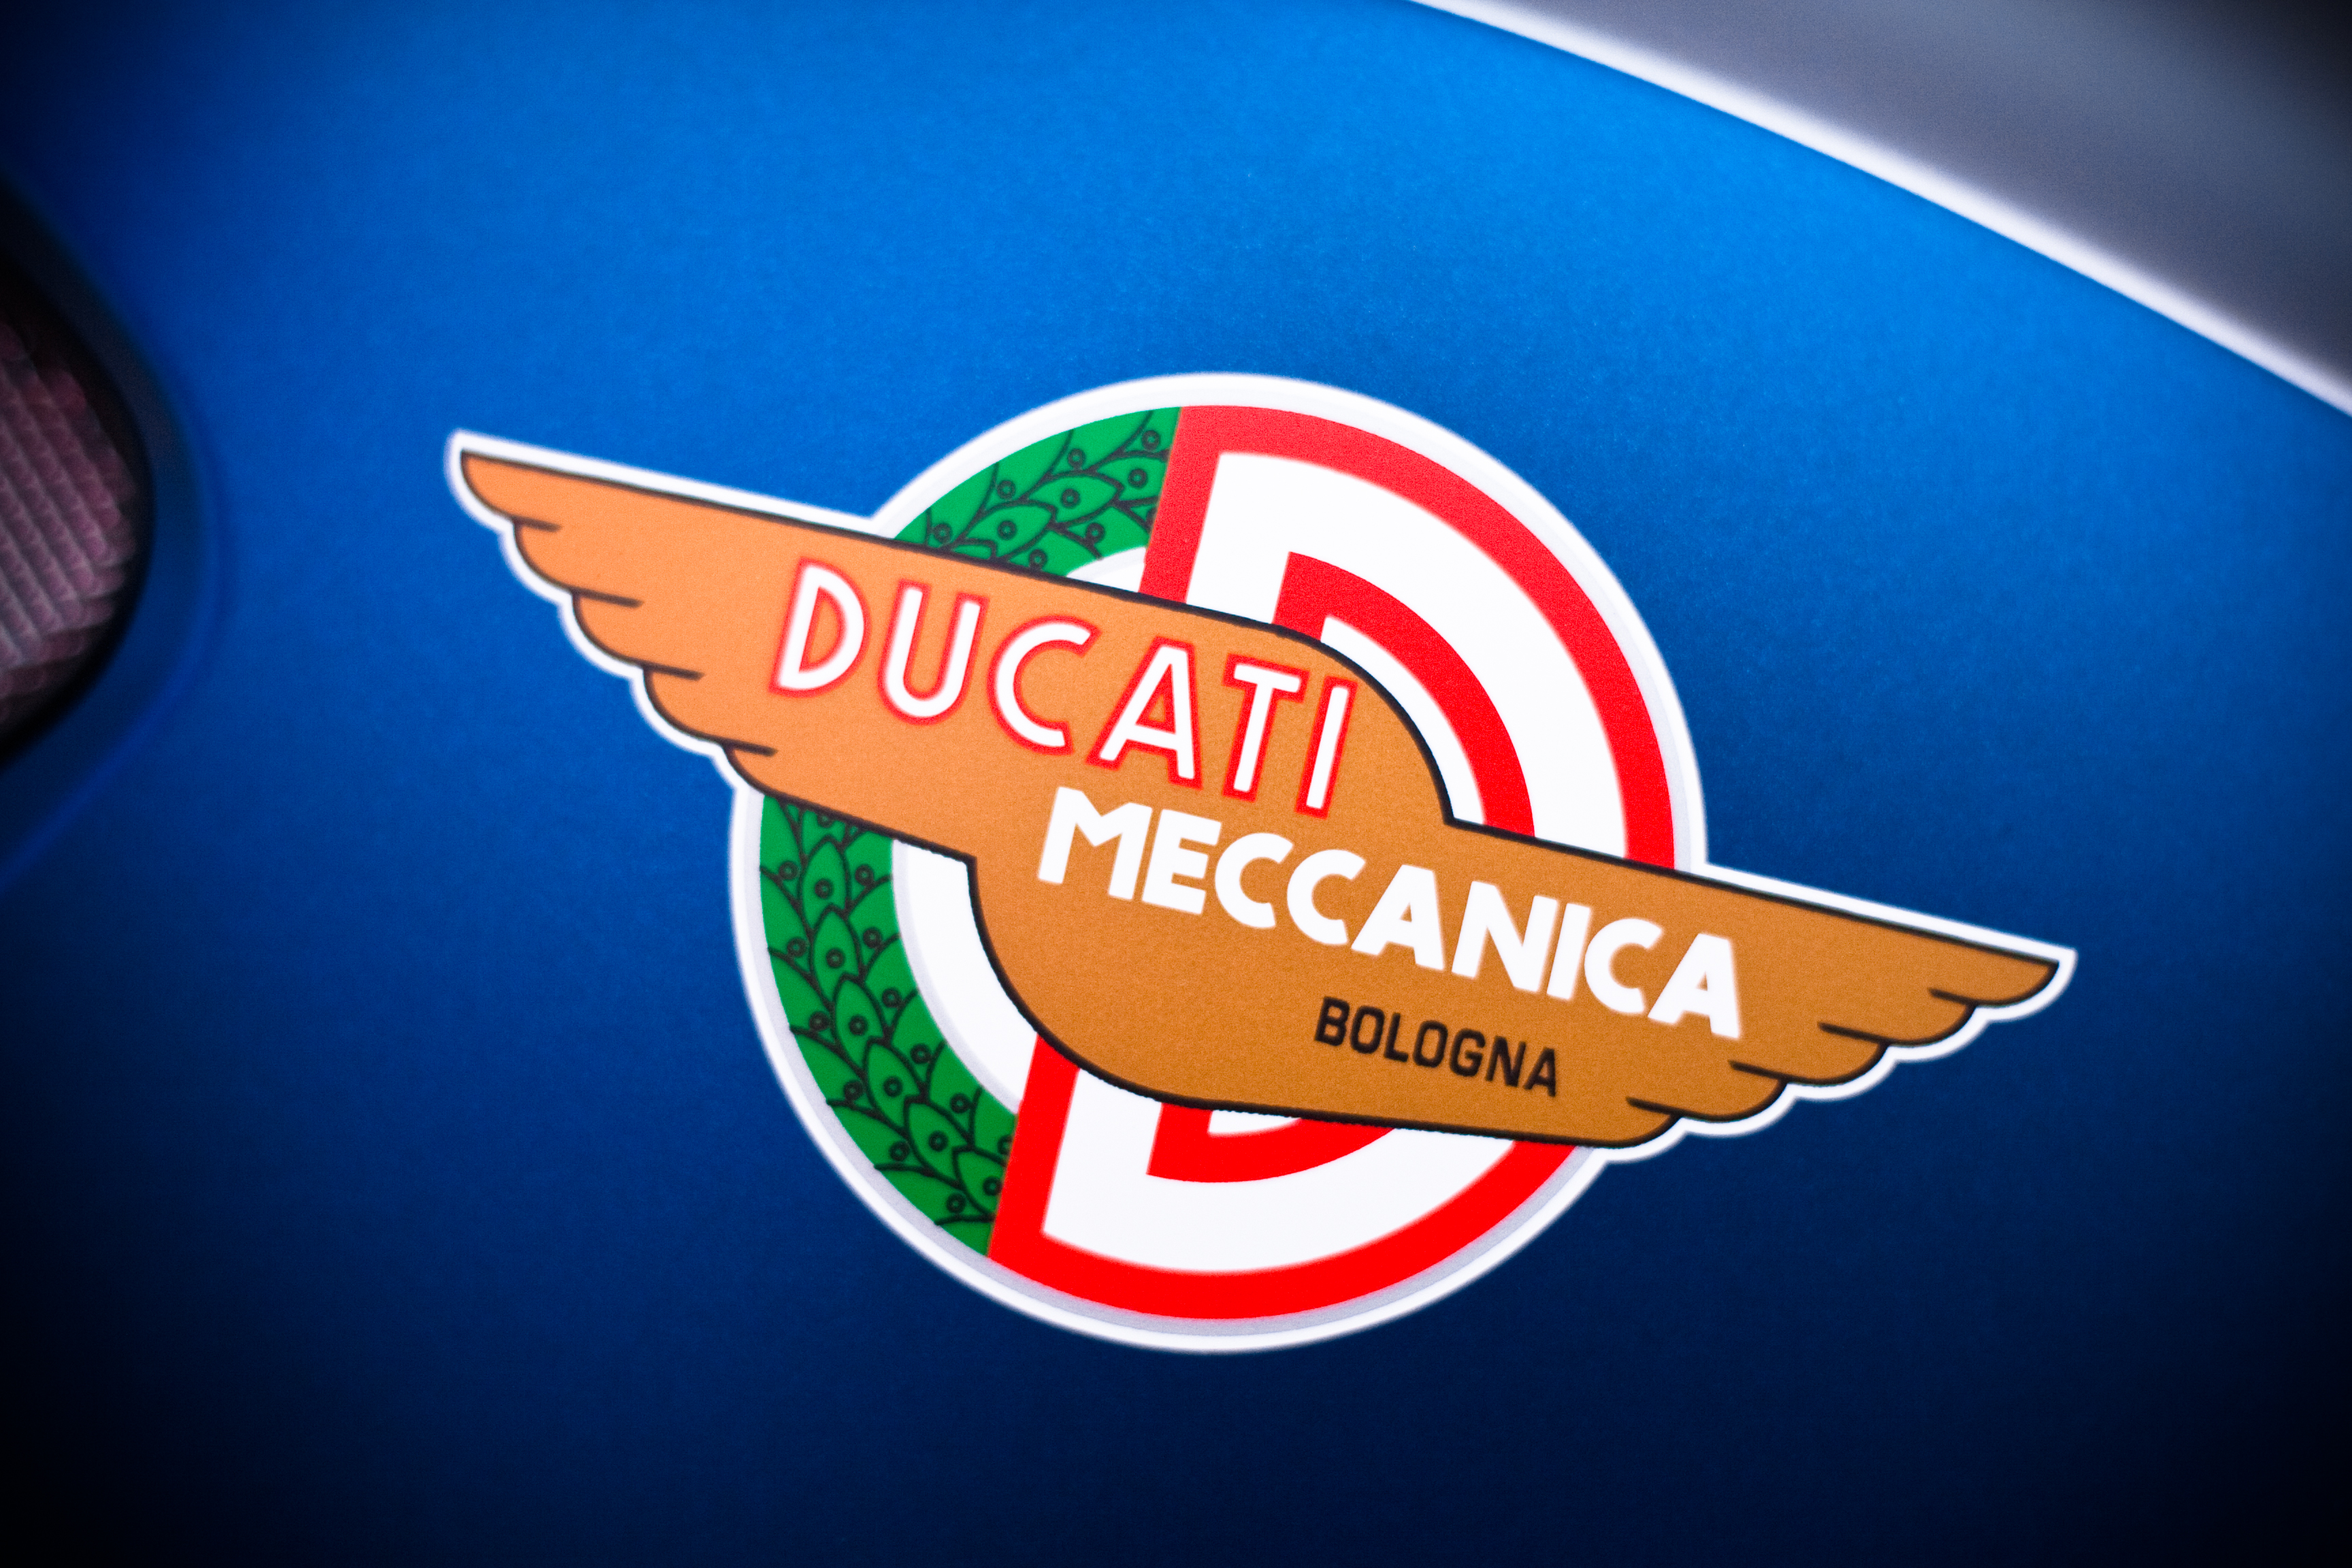 Ducati Monster Meccanica